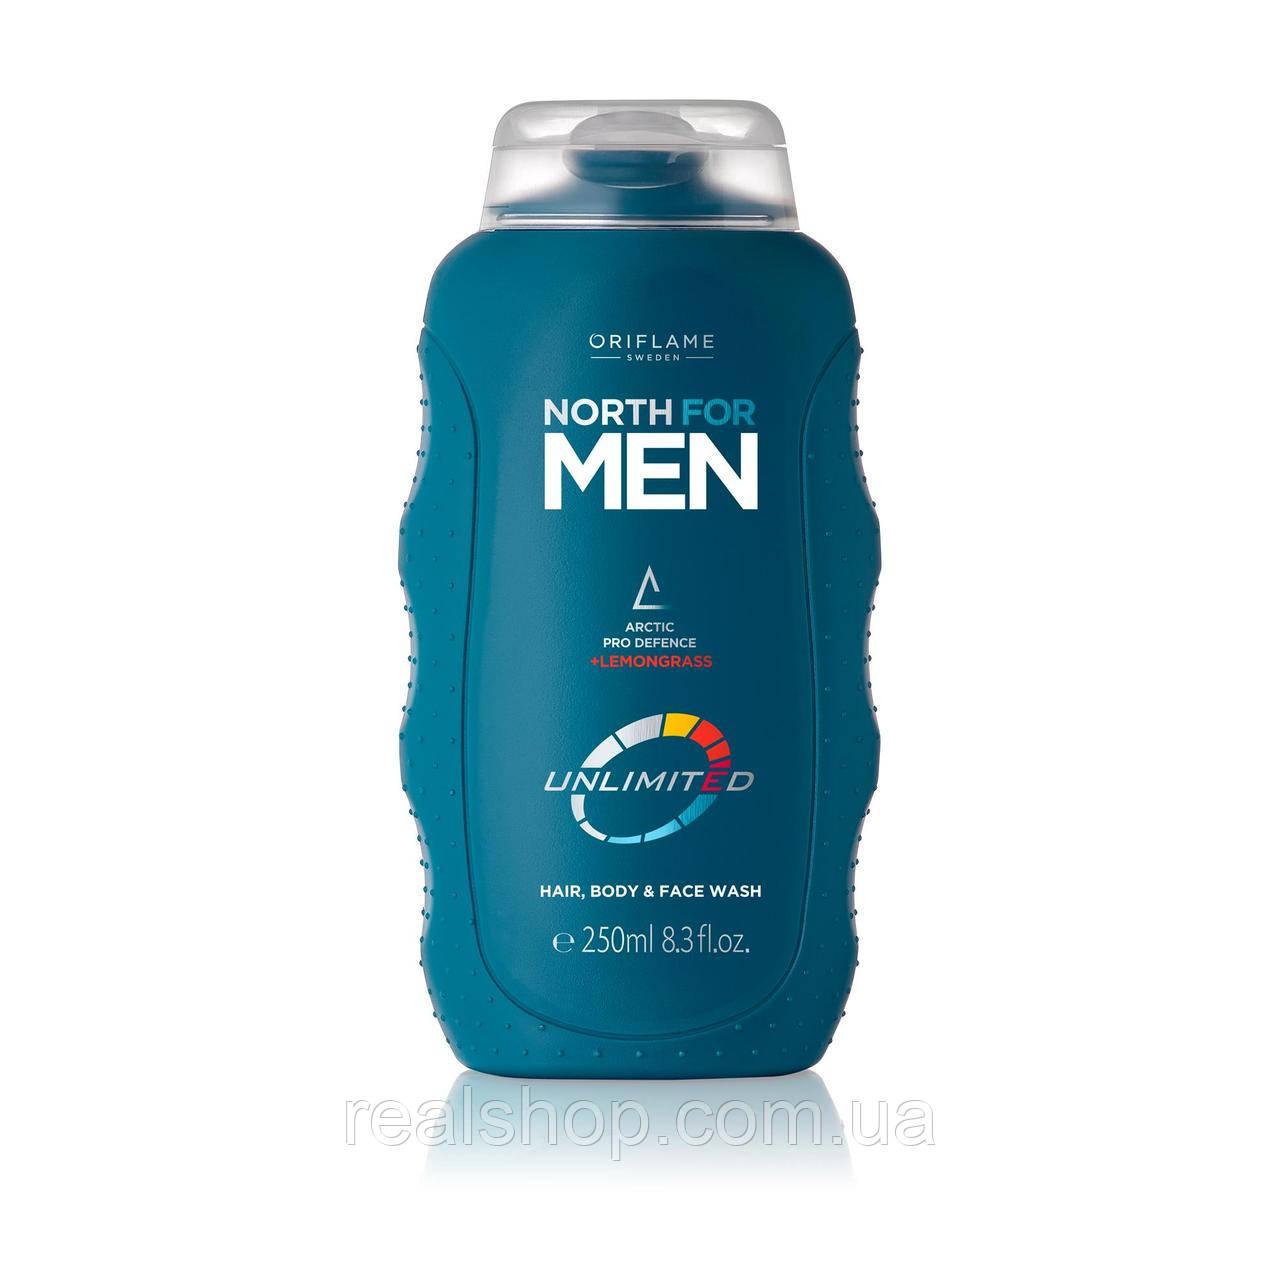 Комплексное средство для душа North for Men Unlimited